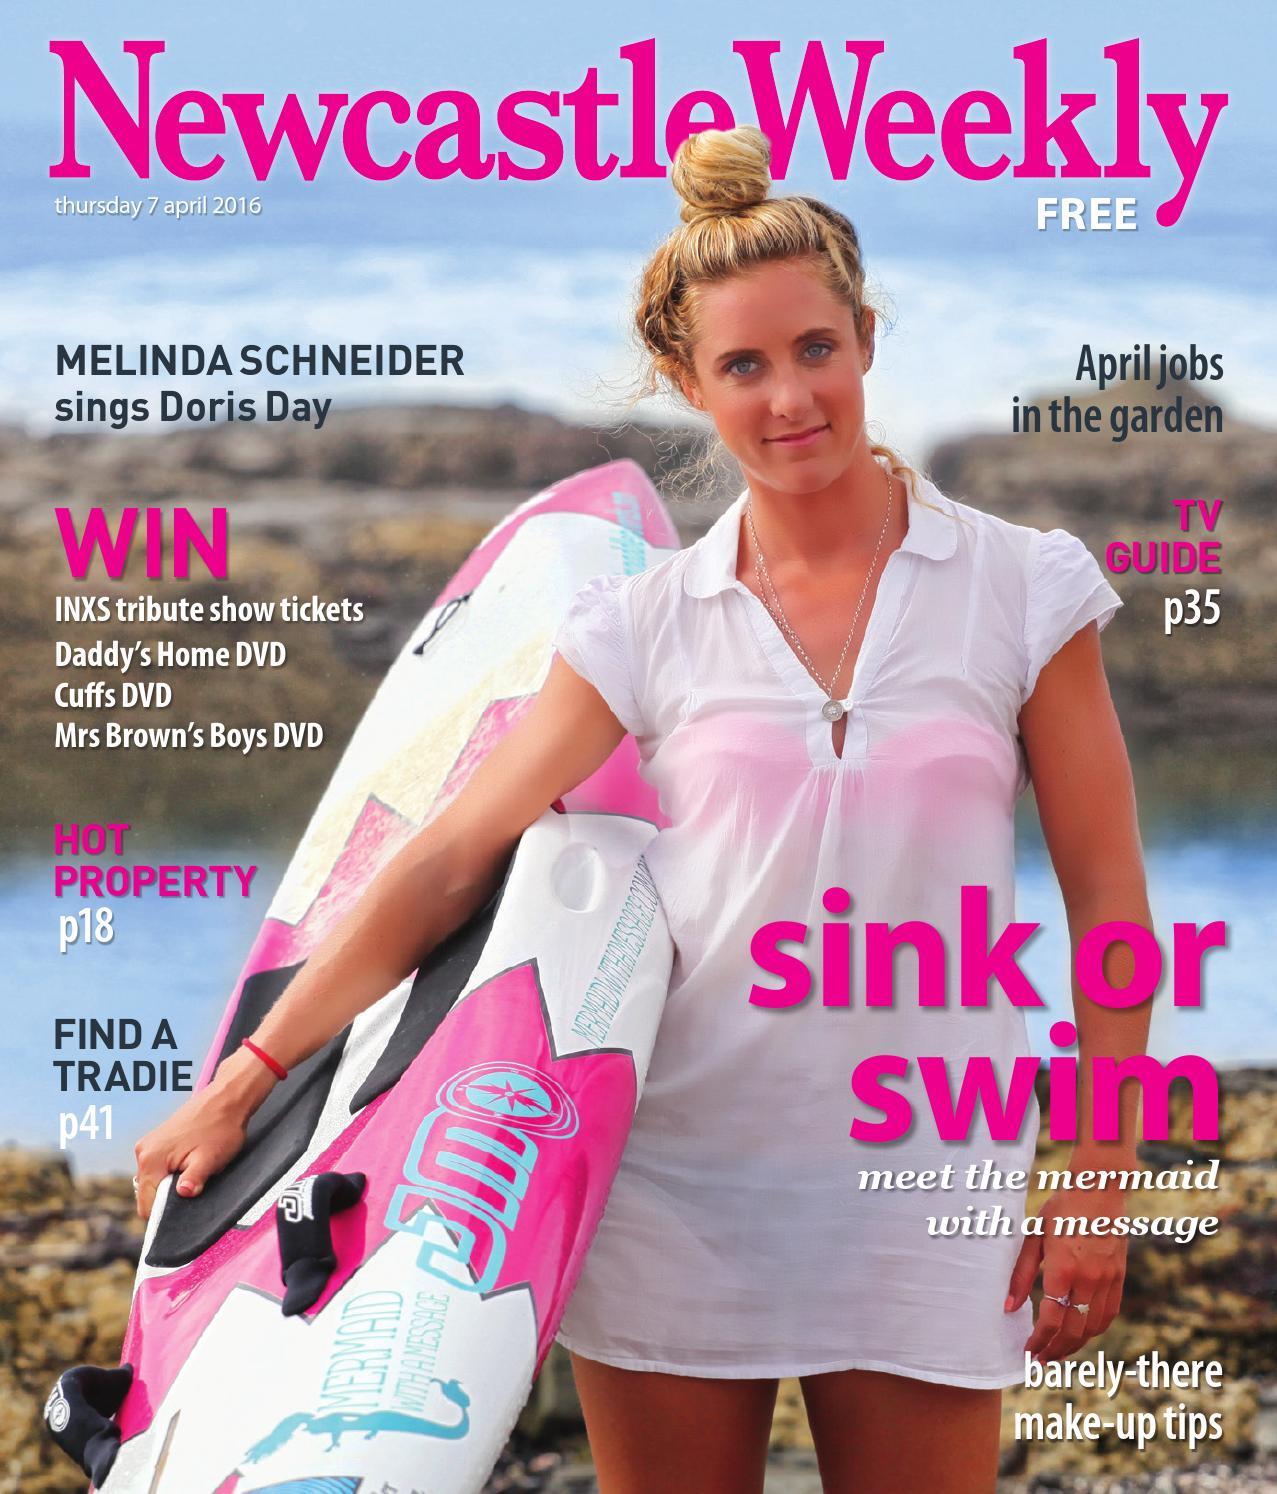 Iris Bahr Nude Good 07 april 2016 - newcastle weekly magazinenewcastle weekly